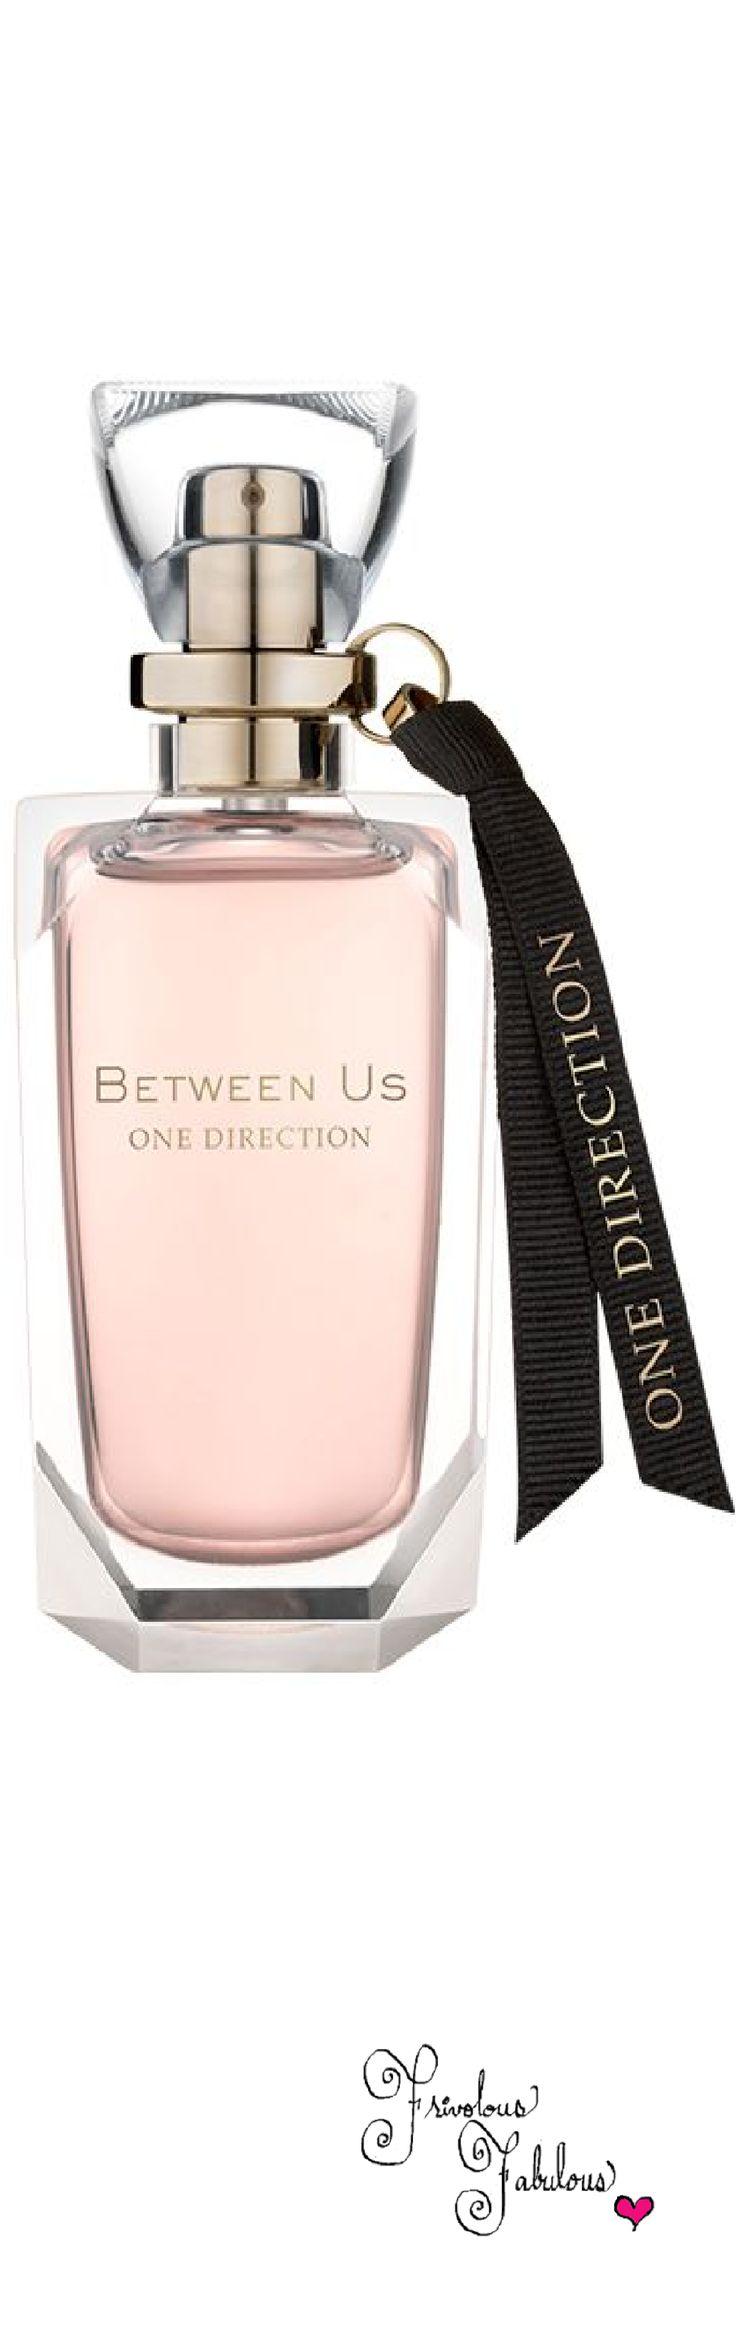 Frivolous Fabulous - Between Us One Direction 2015 for Miss Frivolous Fabulous